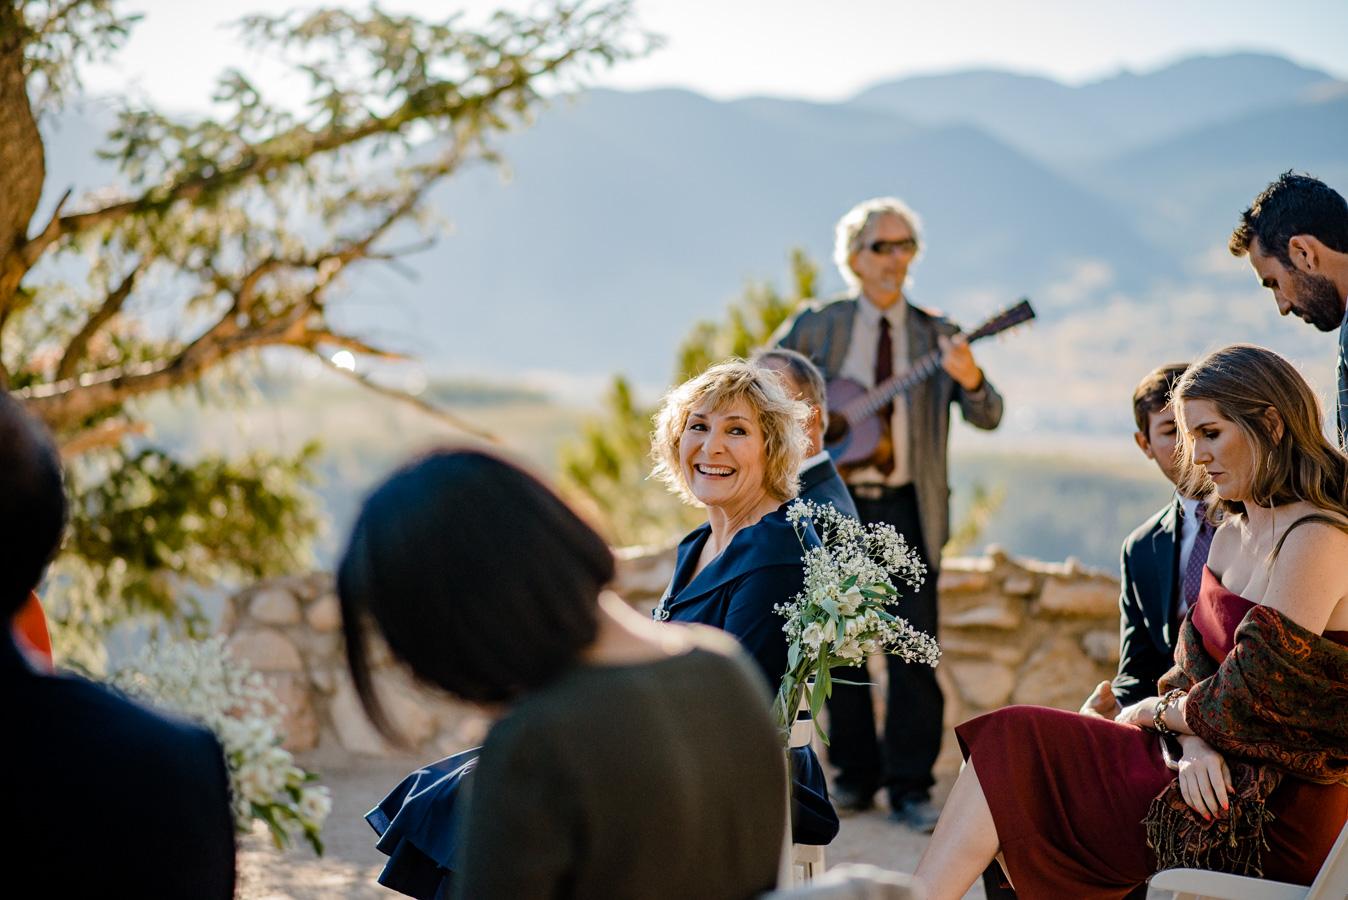 Sapphire Point Overlook Breckenridge, Colorado Mountain Elopement Intimate Wedding { Sarah & Malin} | Capital Hill  Denver Colorado Mountain Elopement Photographer